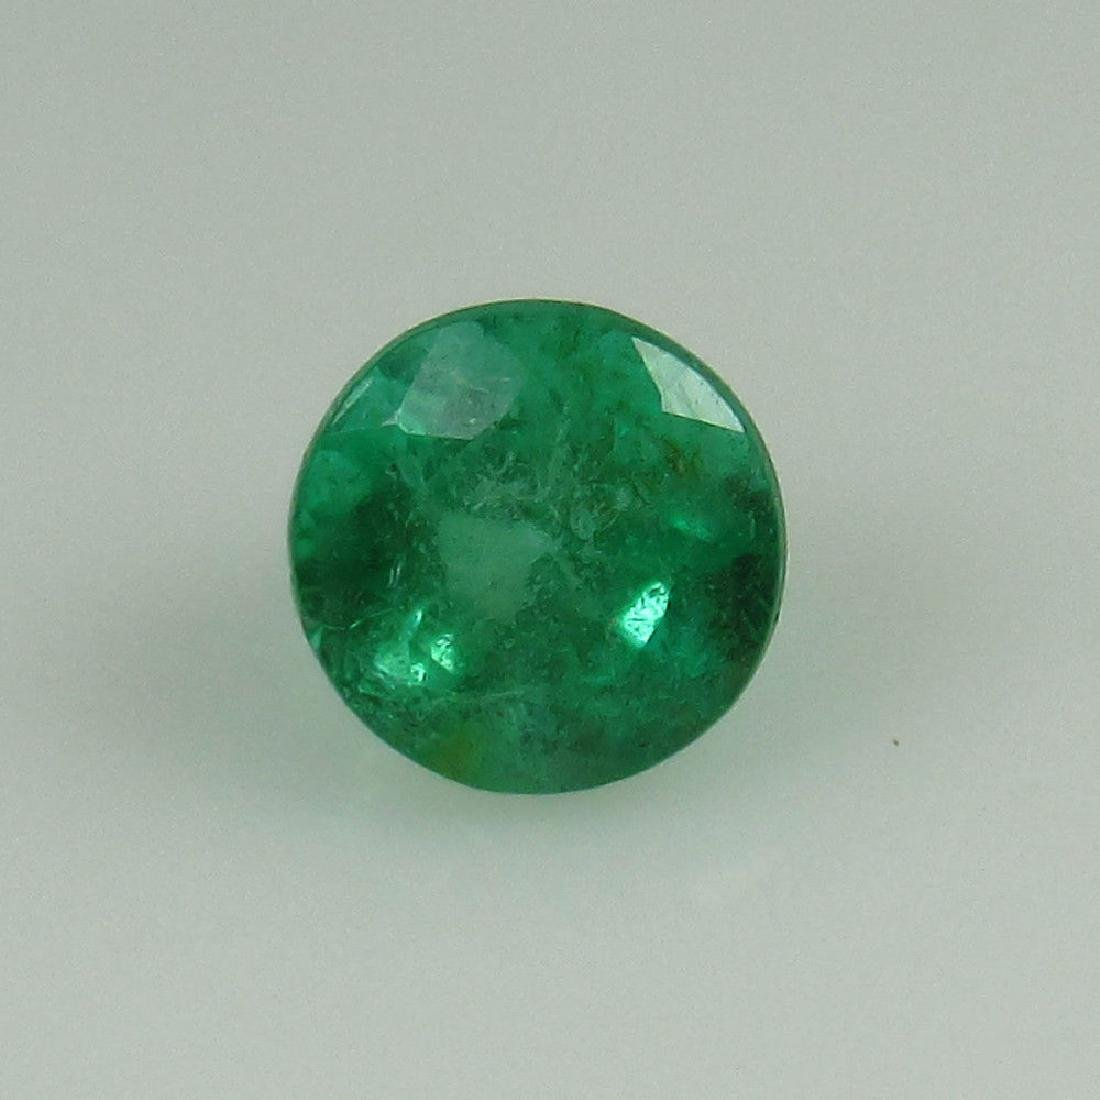 0.40 Ct Genuine Zambian Emerald 4.5 mm Round Cut